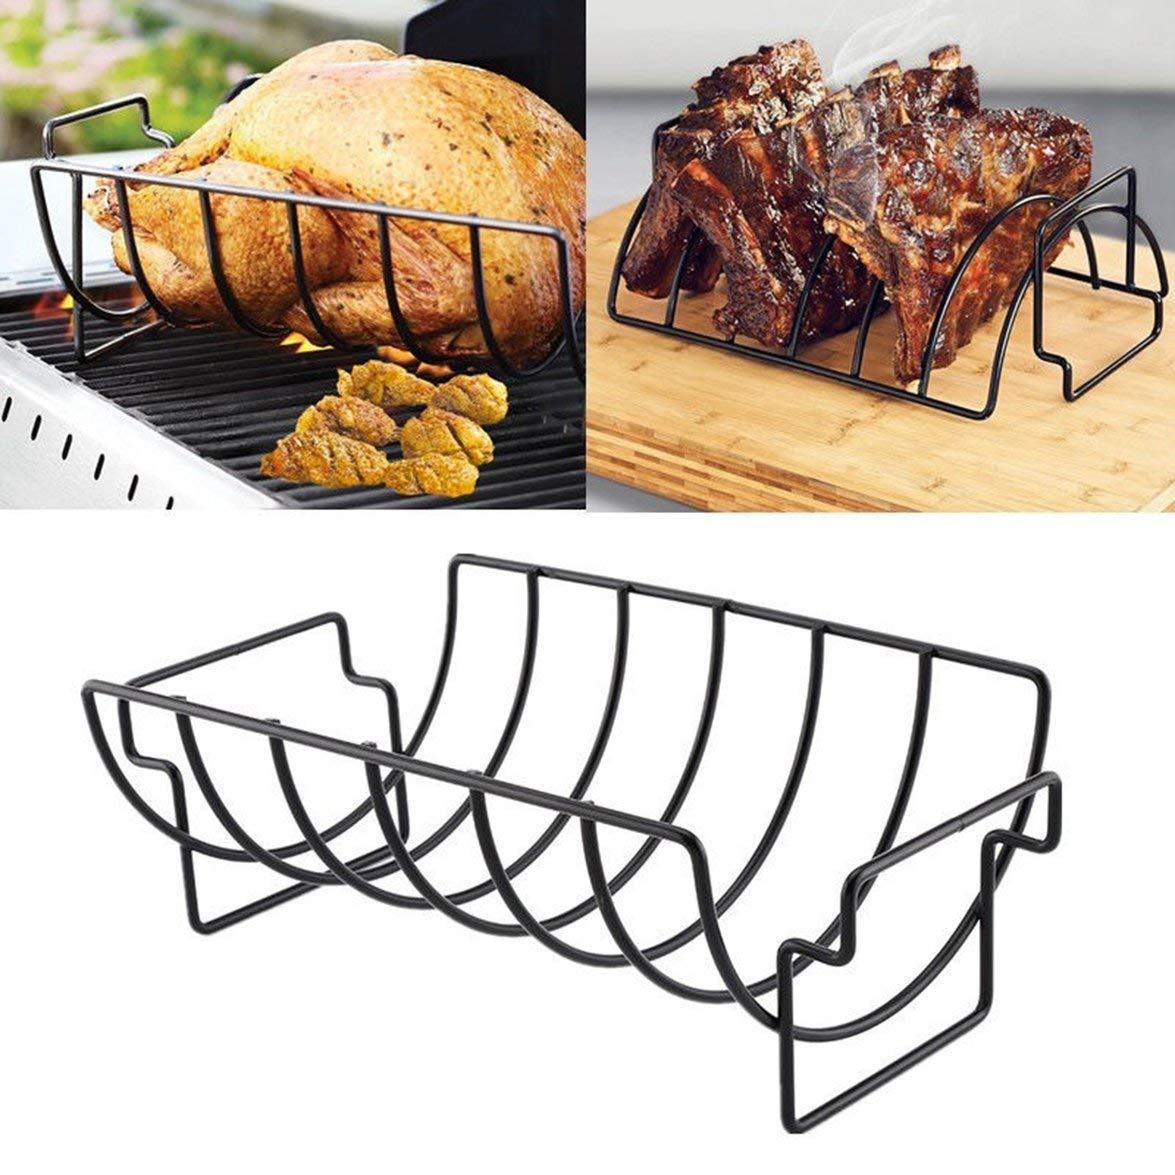 Kongqiabona Rib Rack Home Restaurant Rib Rack Anti-Adh/ésif Griller Barbecue Stand De Poulet Et Boeuf